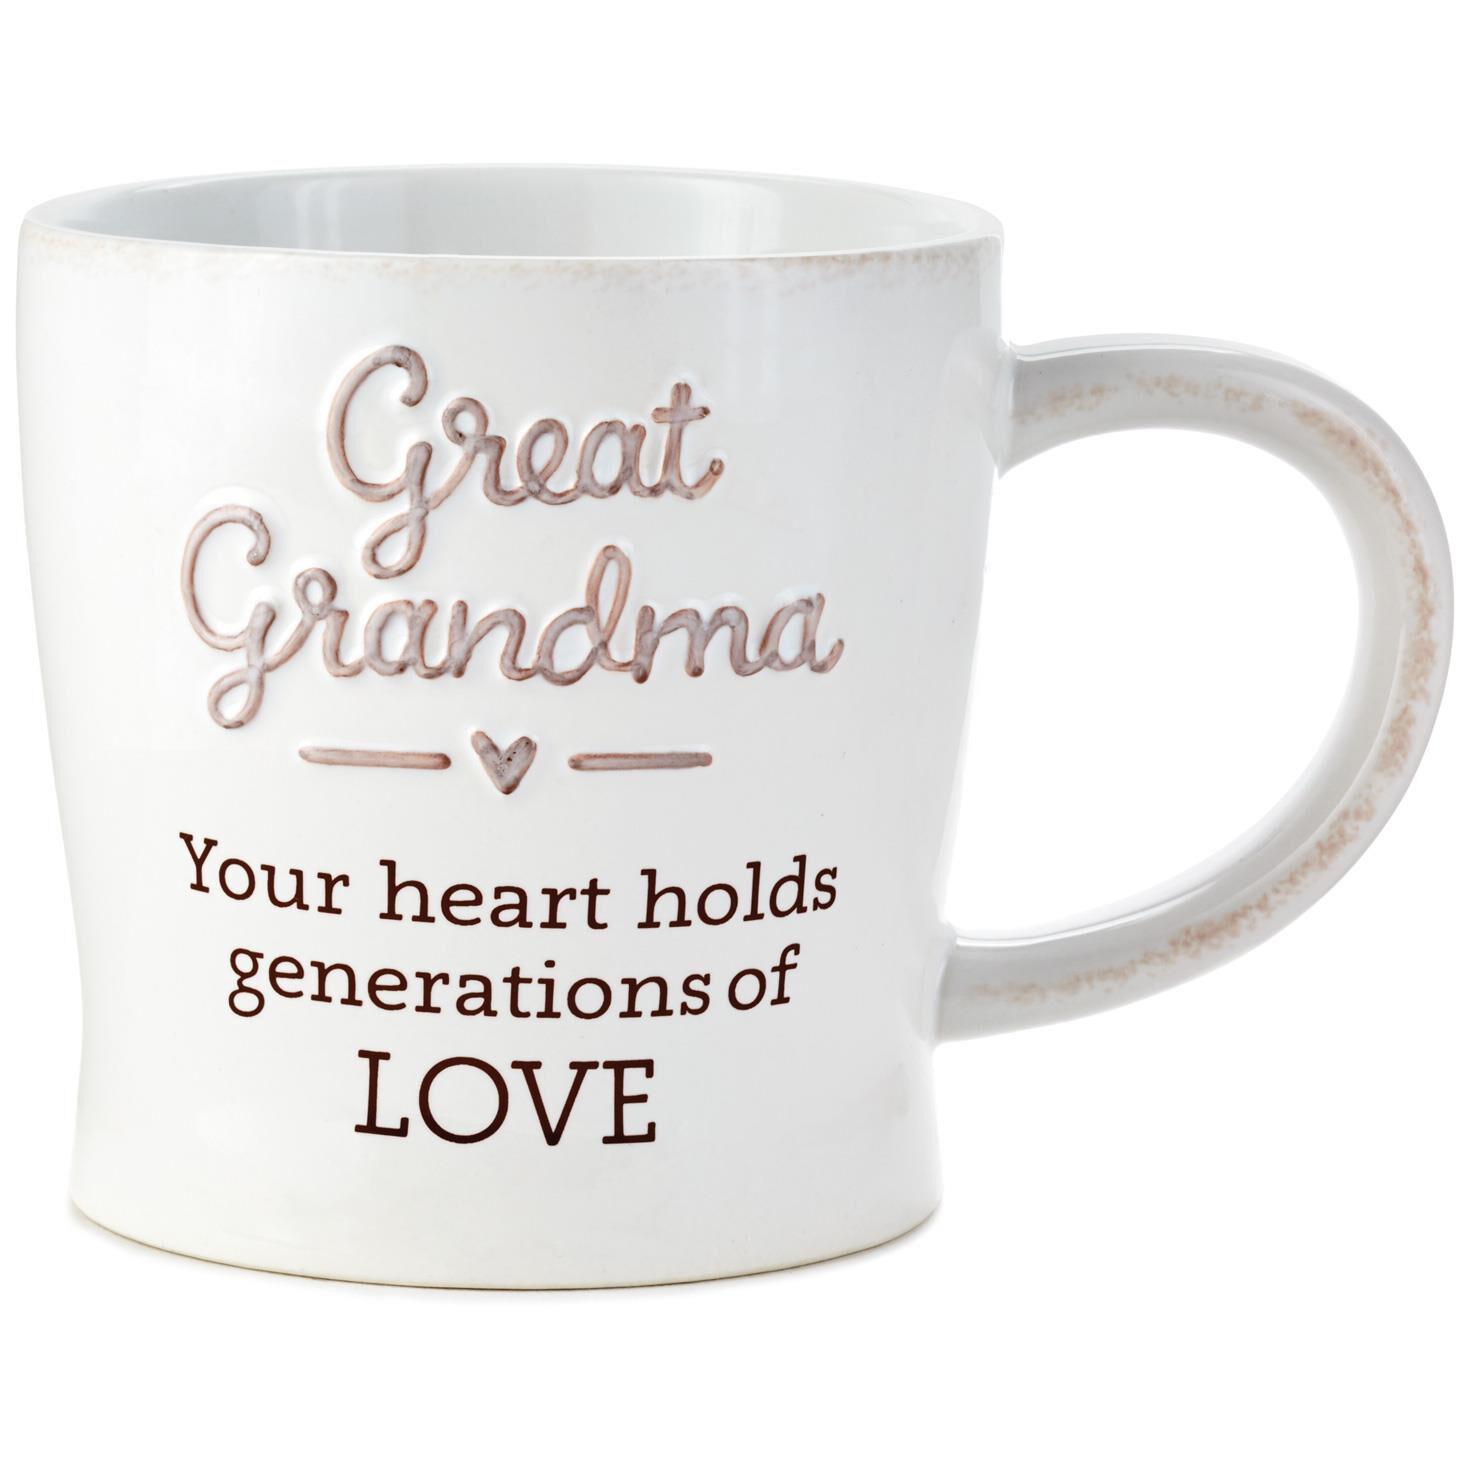 great grandma generations of love mug 12 oz mugs teacups